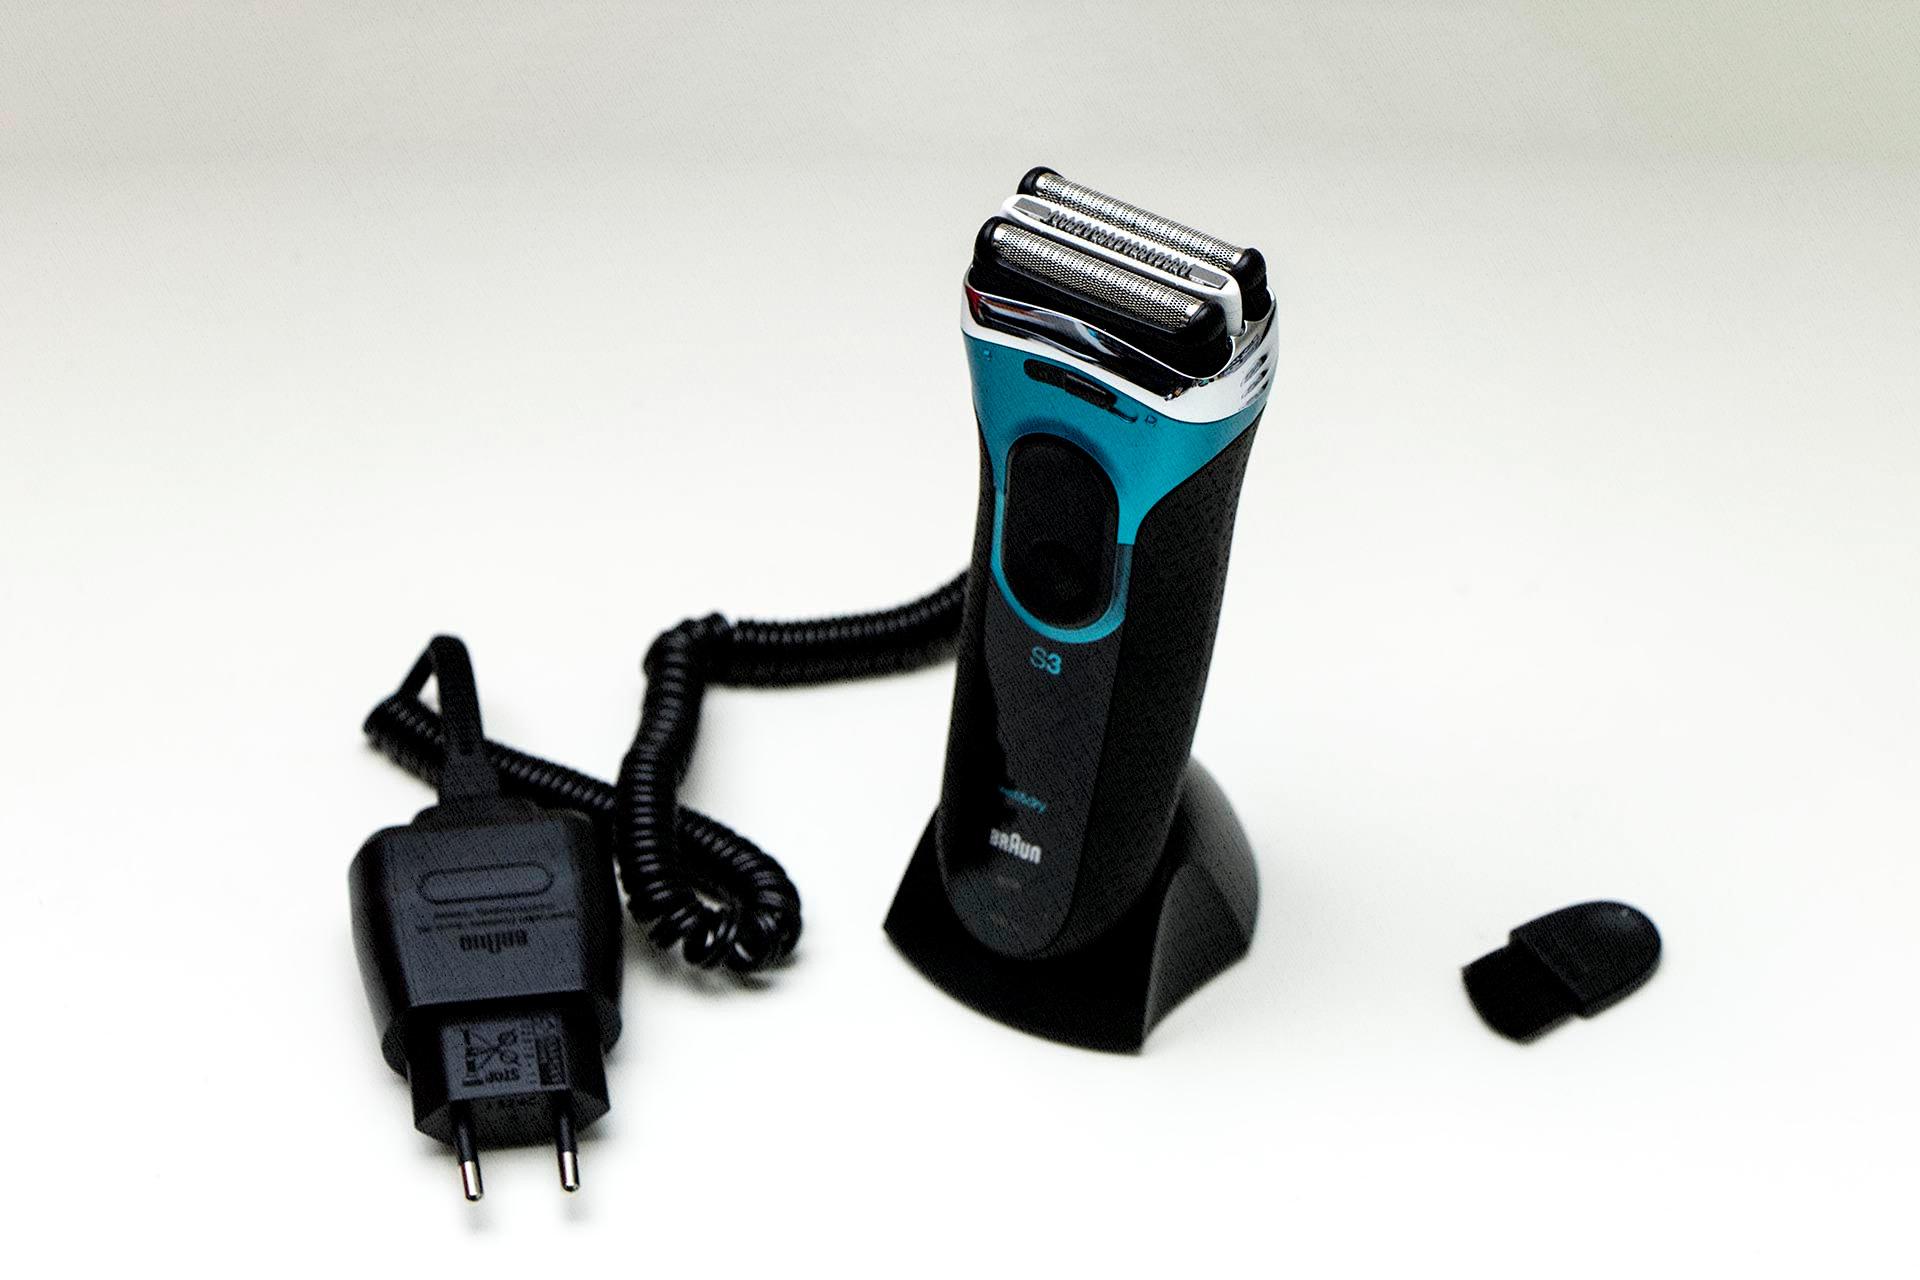 Braun 3080s Series 3 ProSkin